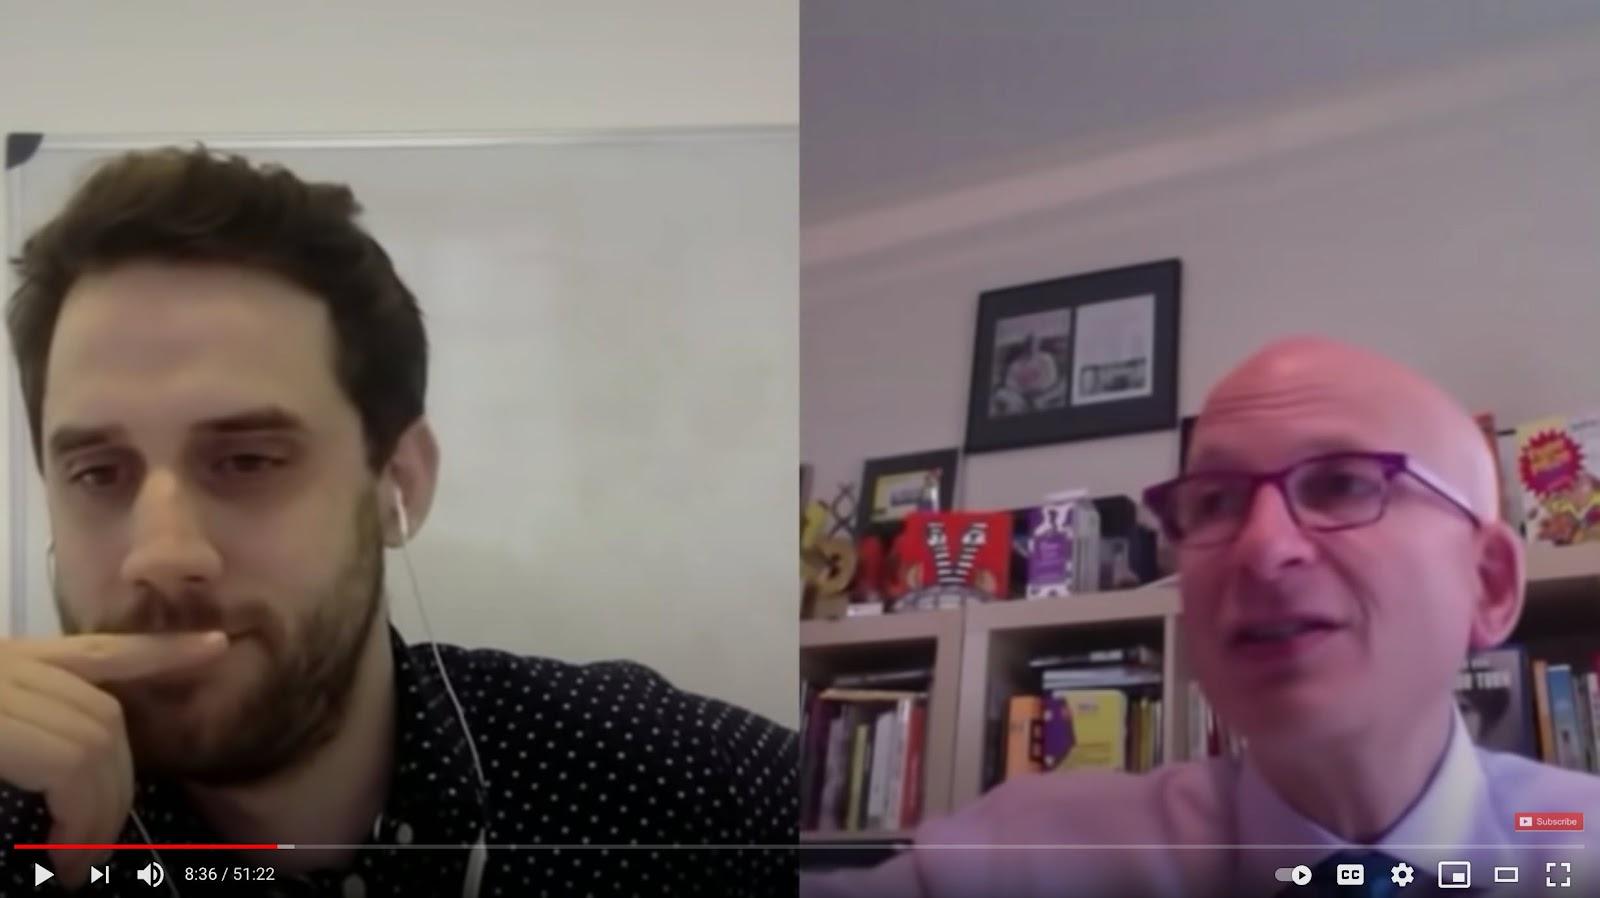 Seth Godin on how marketing goes much deeper than communications